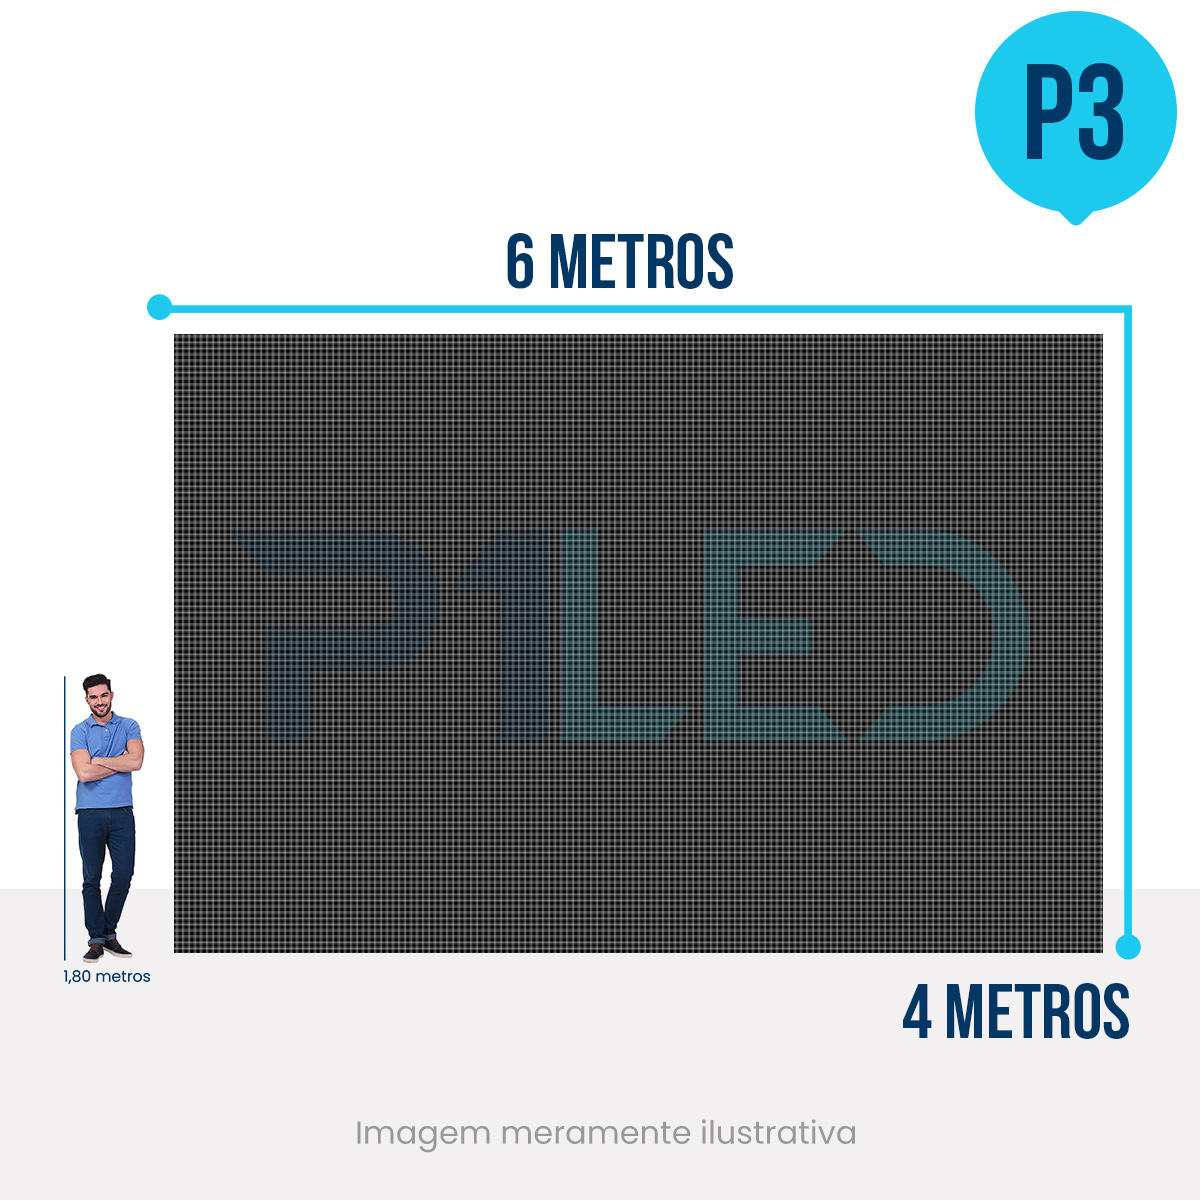 Painel de LED para Shopping 6x4 - Telão P3 Indoor  - Painel e Telão de LED - O Melhor Preço em Painel de LED | P1LED